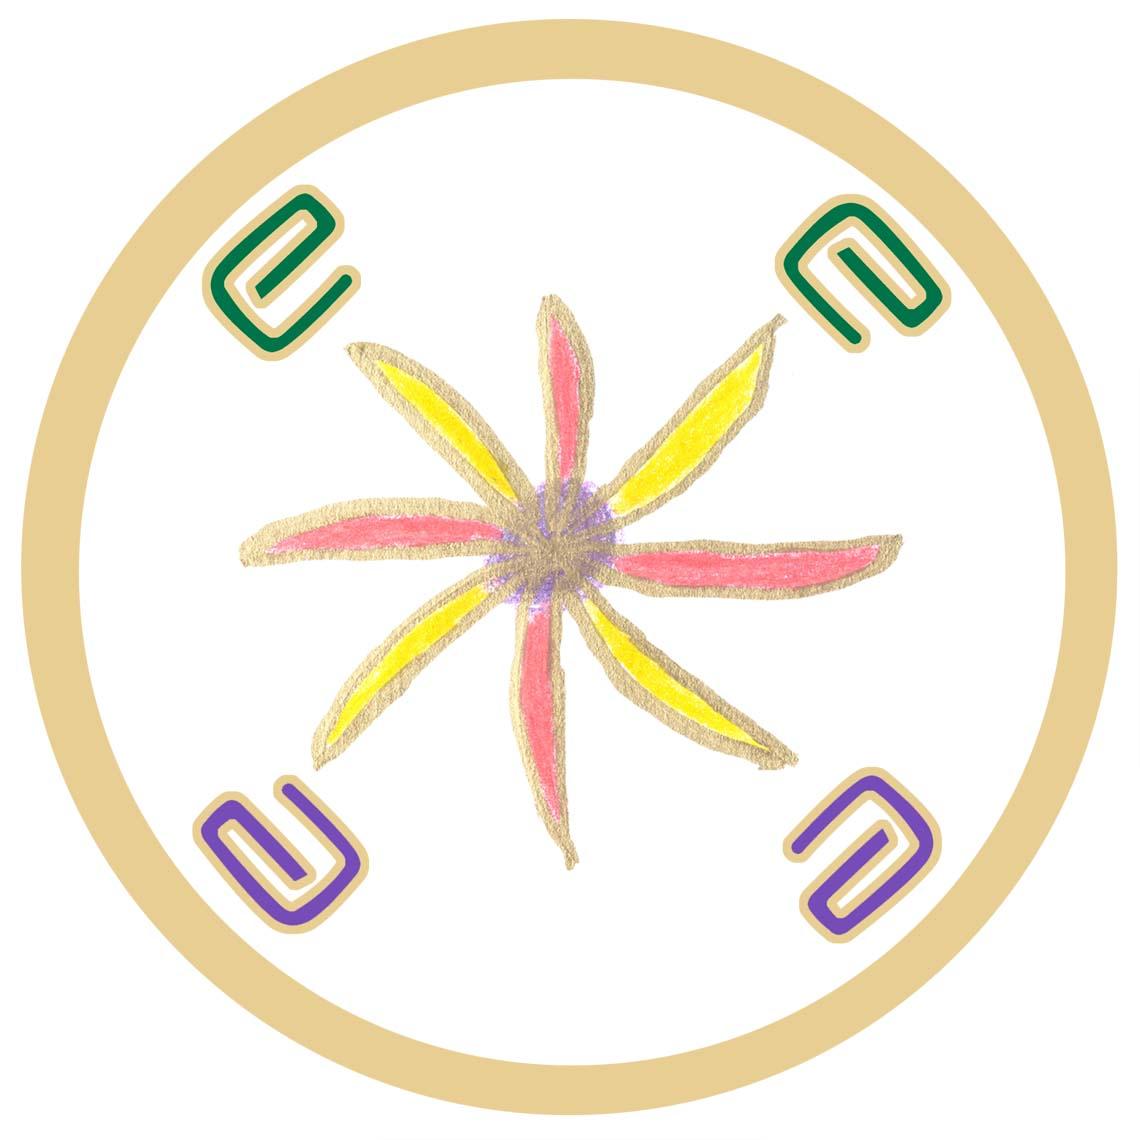 Free symbols access empowered spirit high energy buycottarizona